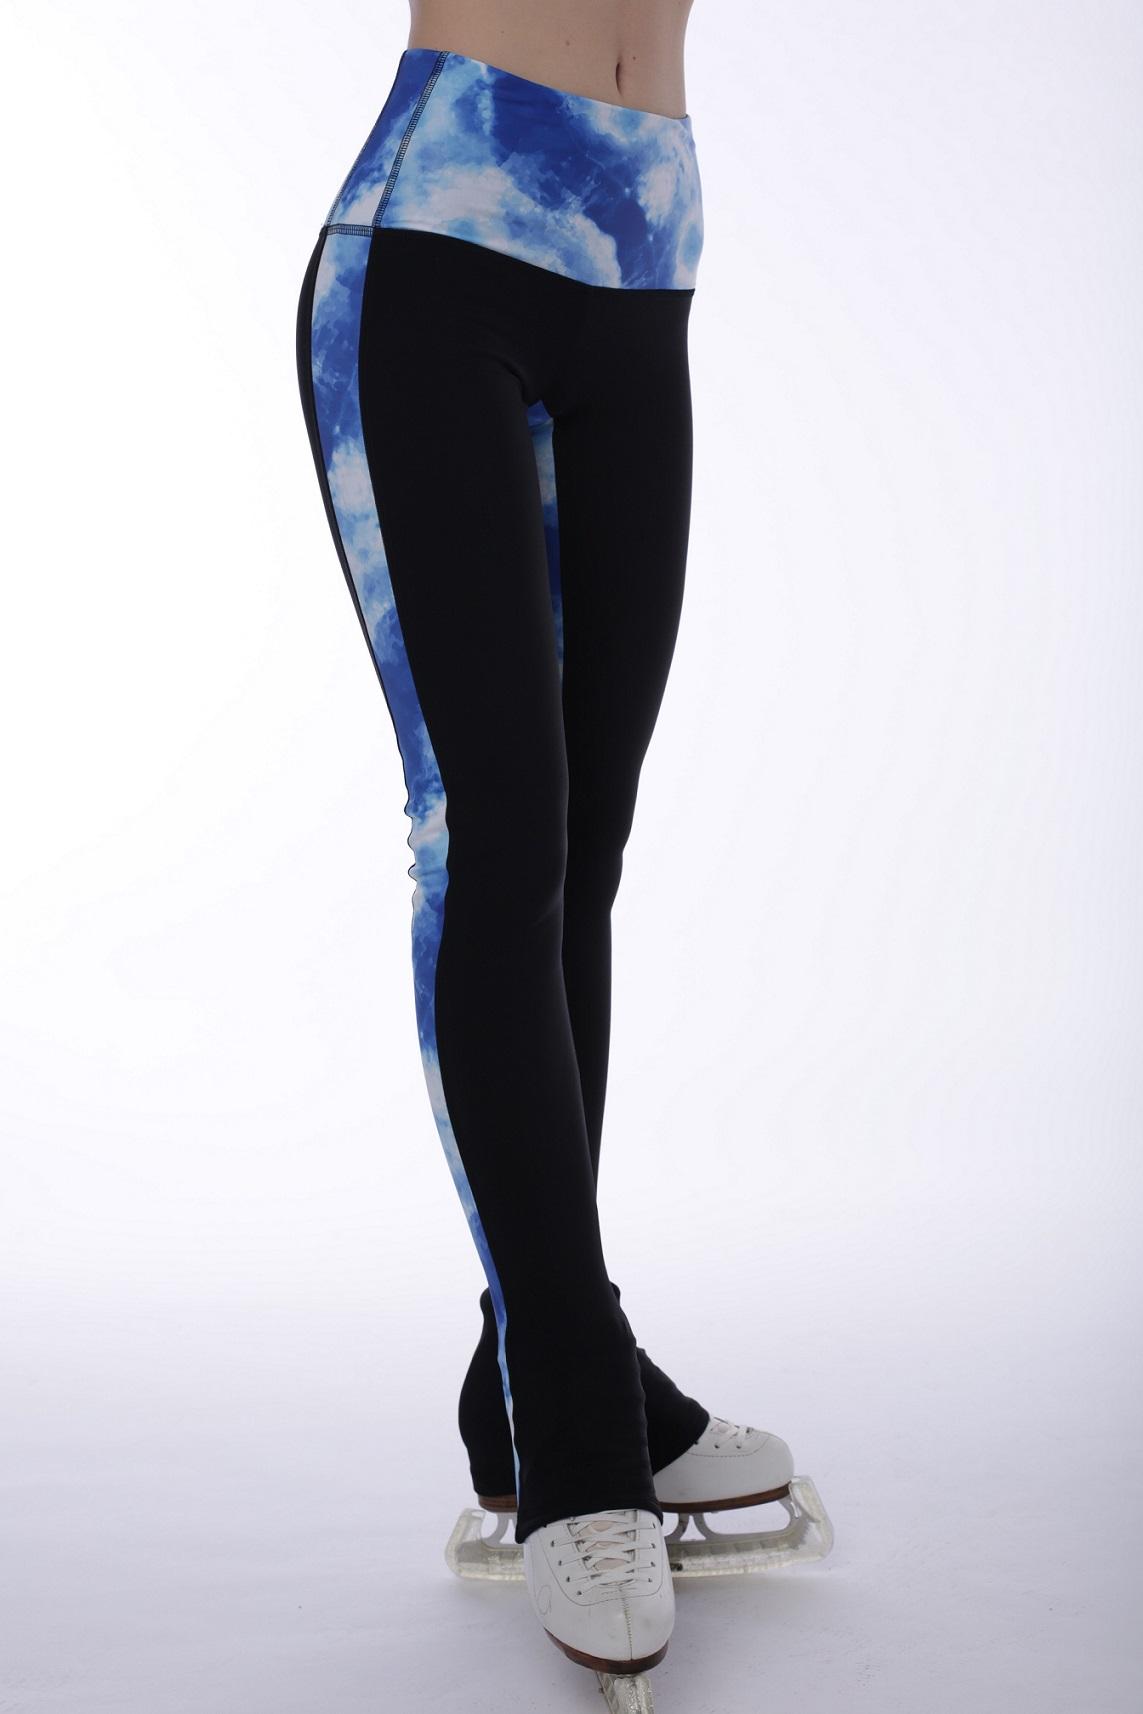 Thuono Linx Trousers (Sky Blu)